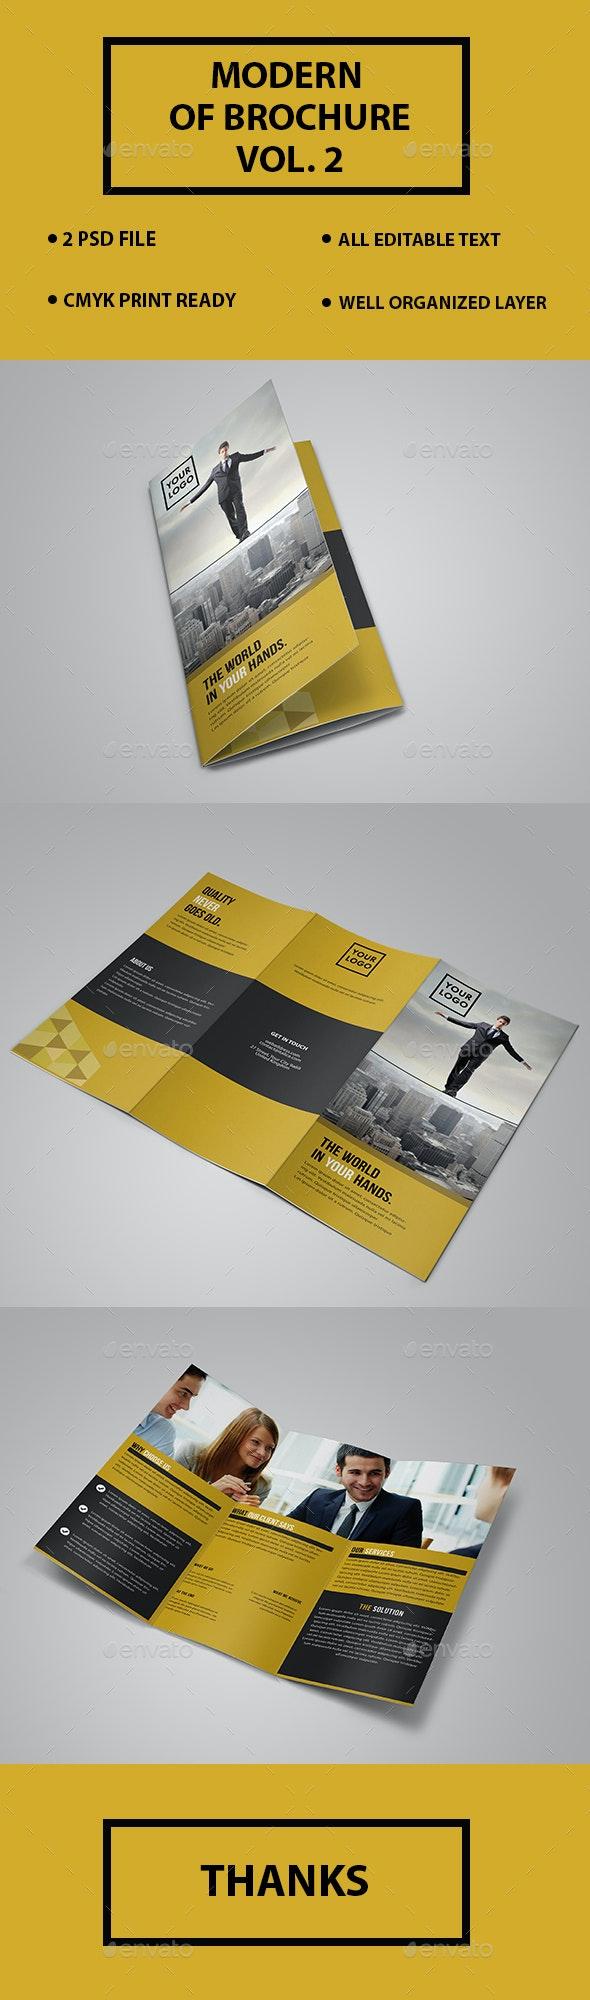 Creative Trifold Brochure Template - Brochures Print Templates